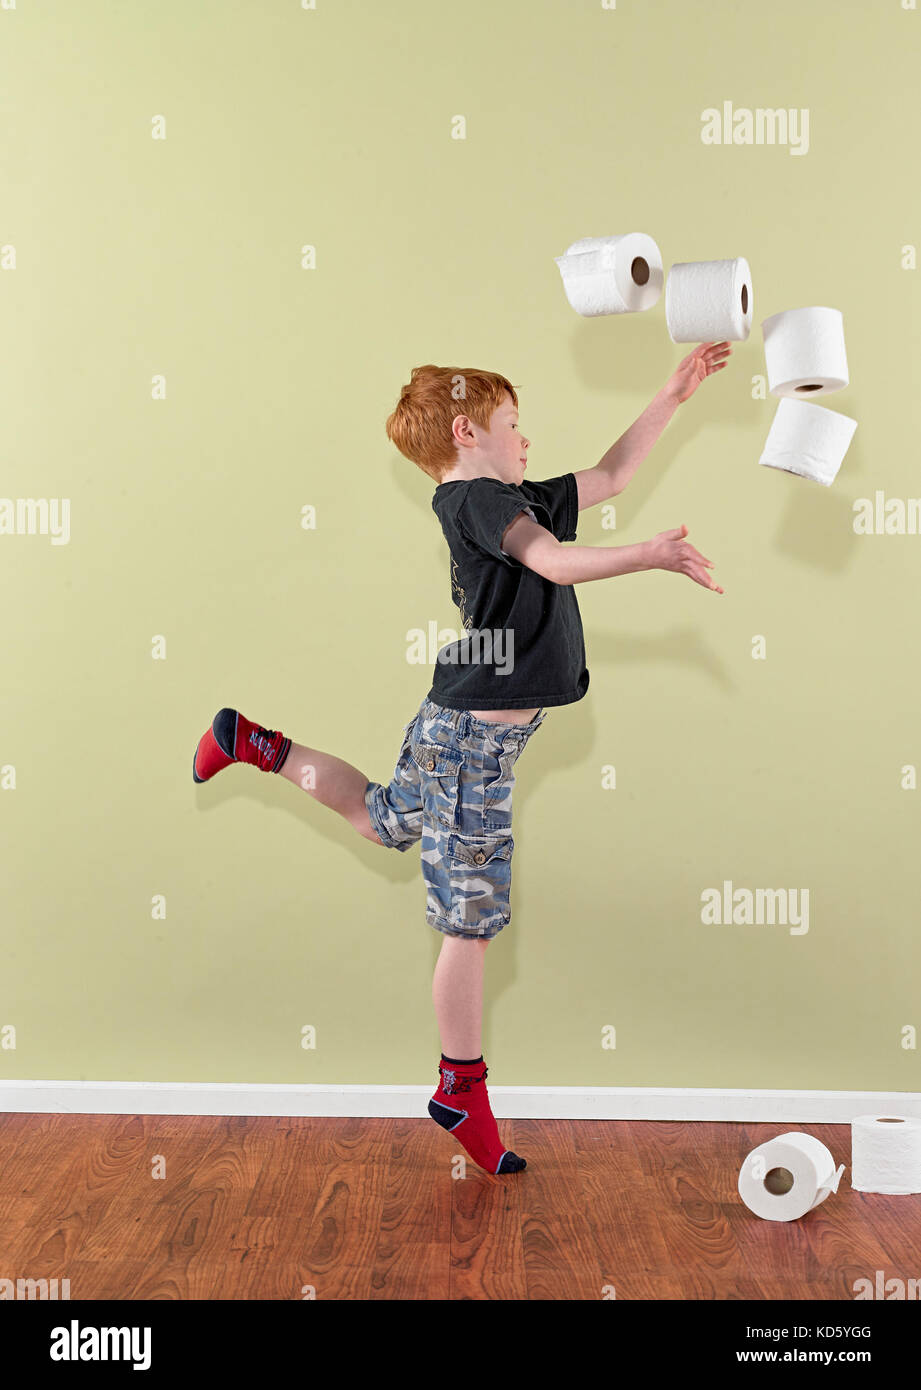 Boy 4-7 throwing rolls of toilet paper - Stock Image